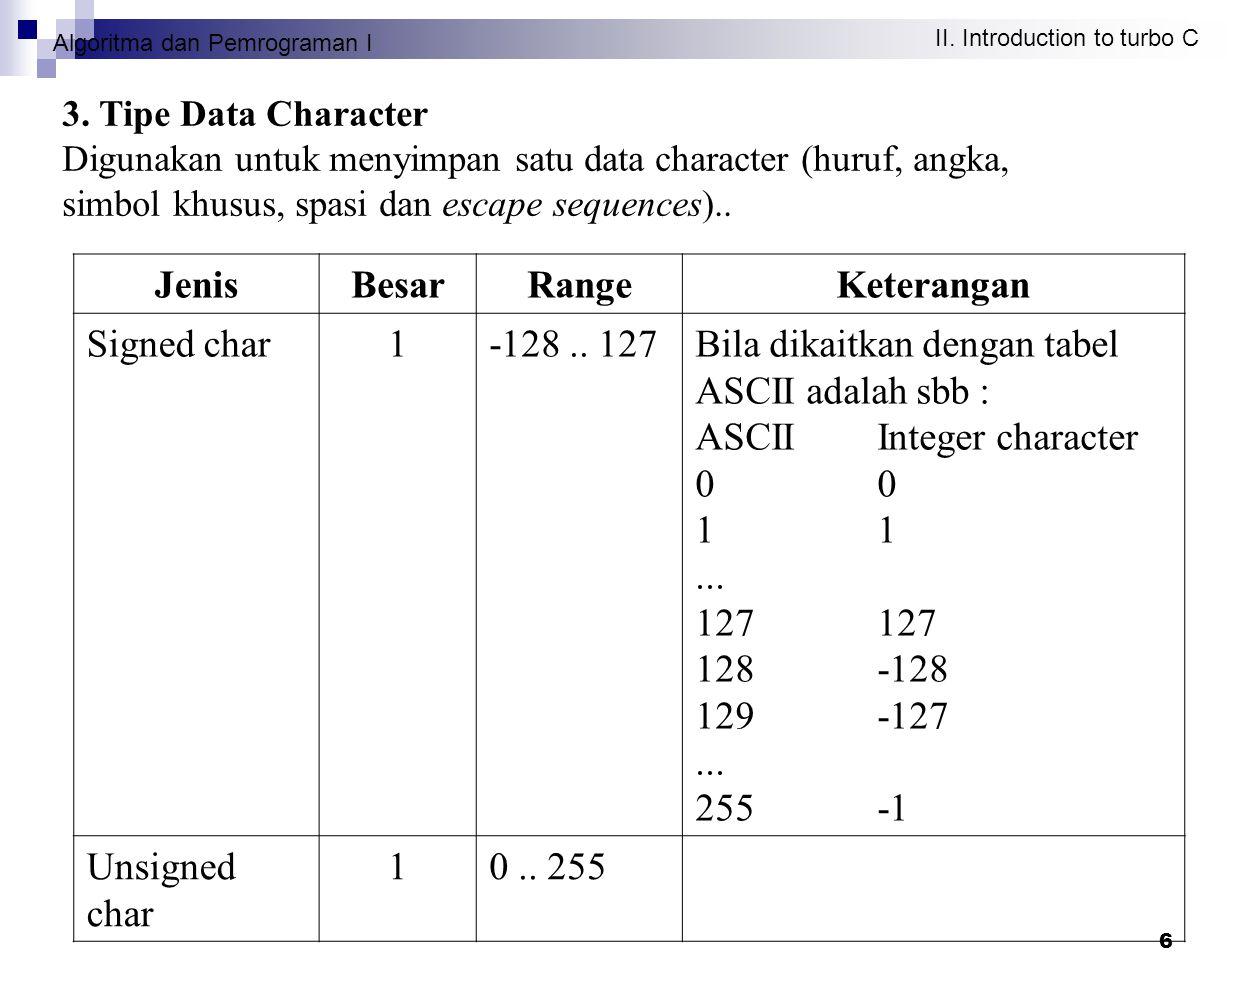 Algoritma dan Pemrograman I II. Introduction to turbo C 6 3. Tipe Data Character Digunakan untuk menyimpan satu data character (huruf, angka, simbol k